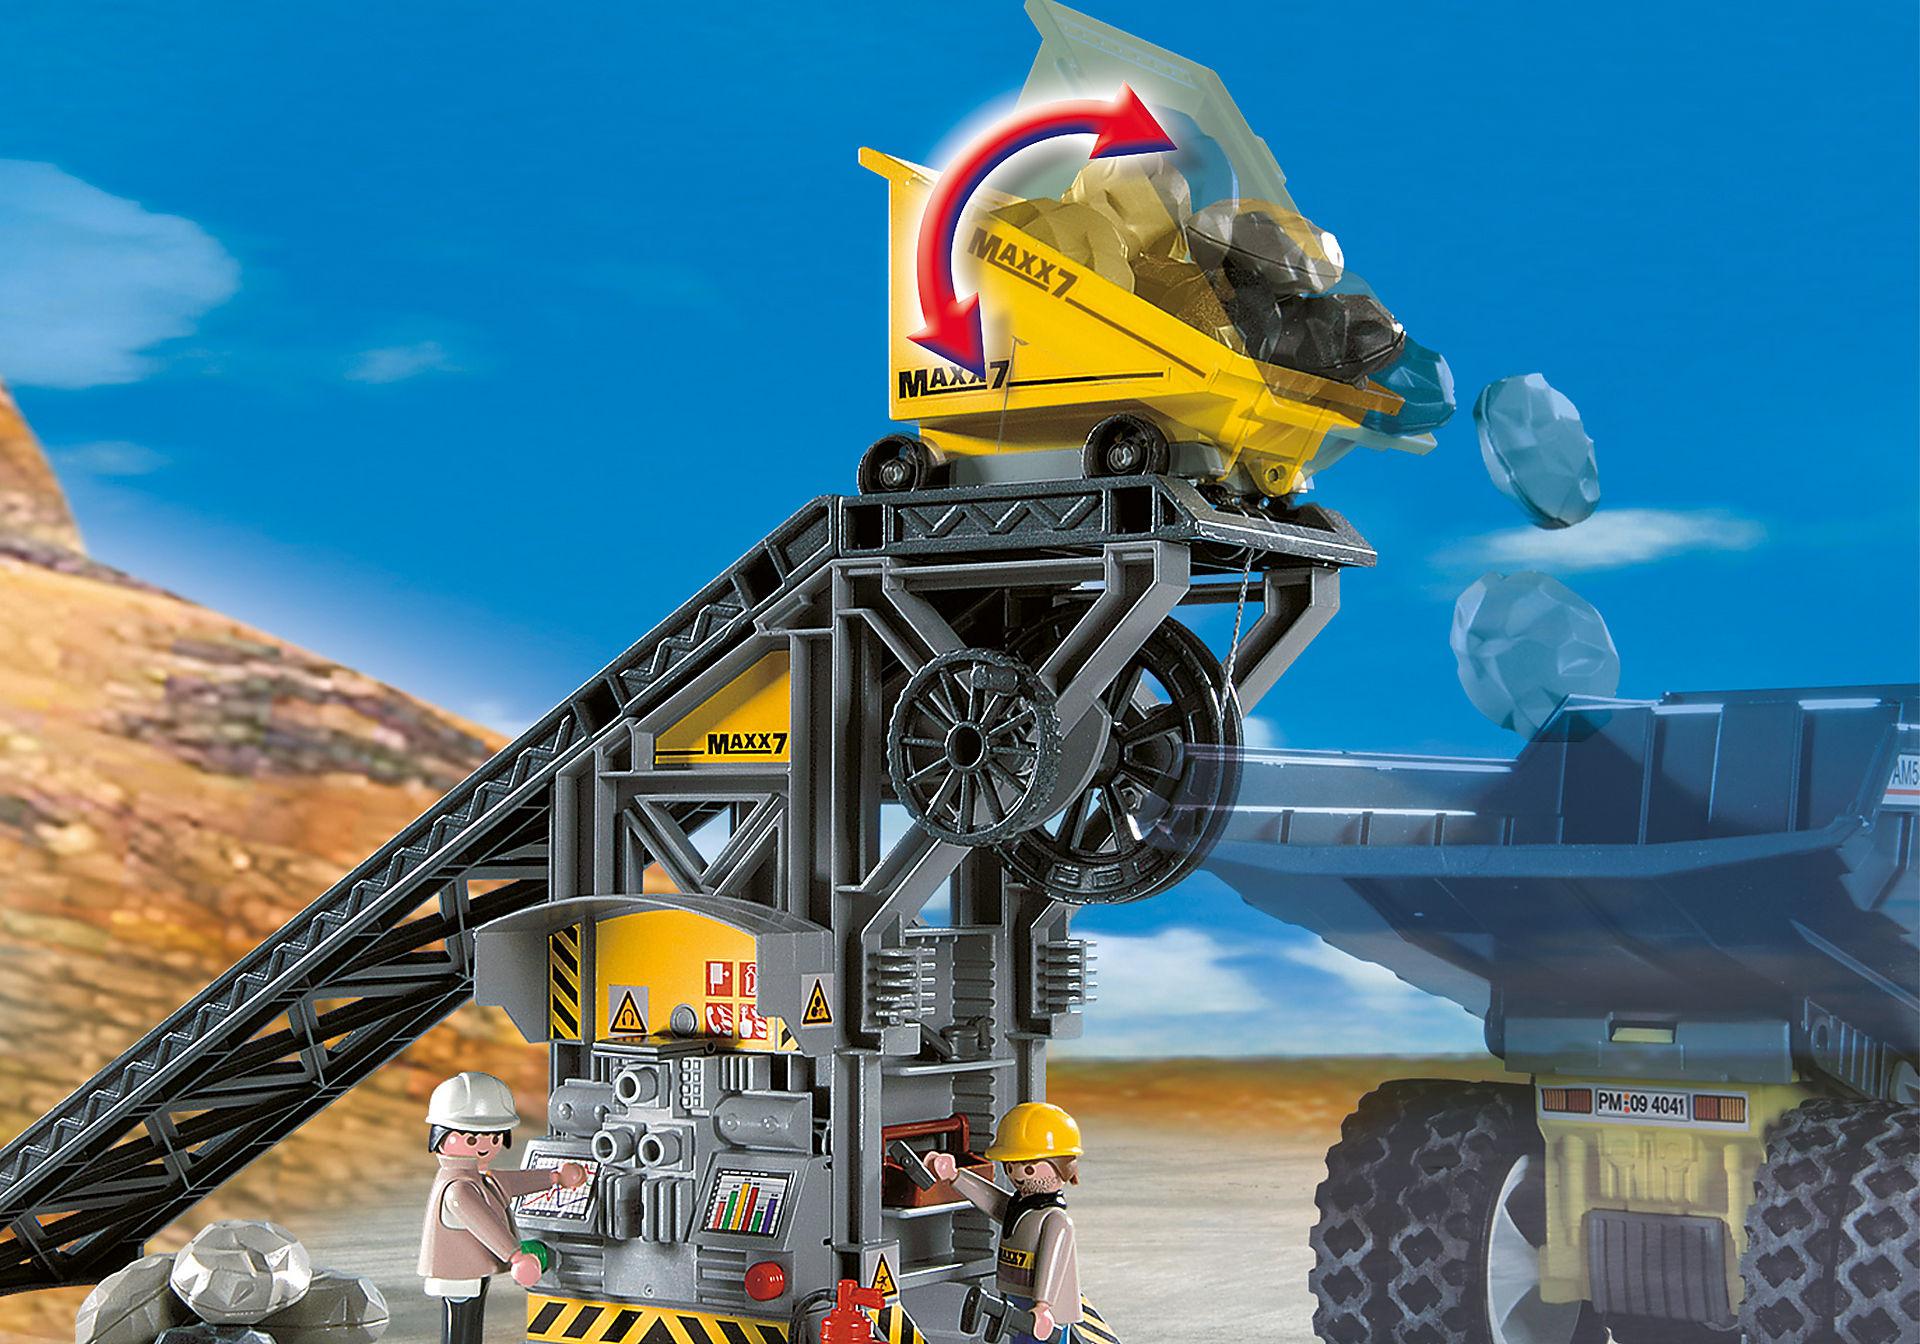 4041 Conveyor Belt with Mini Excavator zoom image6